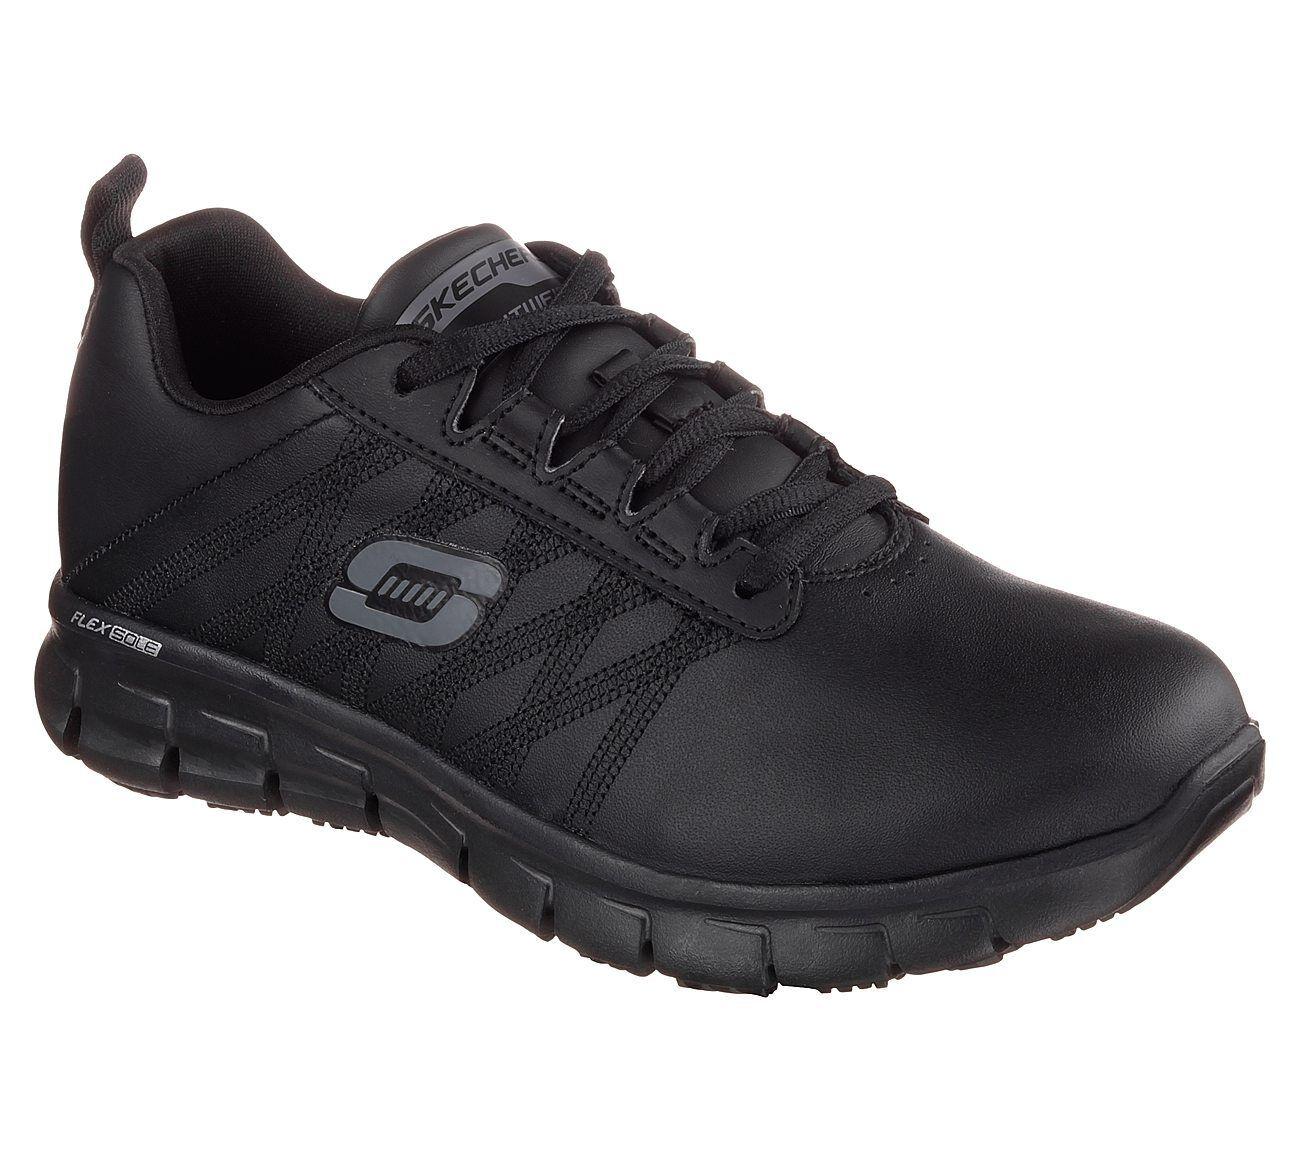 Skechers Work Relaxed Fit Resistant Sure Track Erath Schuhes Slip Resistant Fit Leder Damenschuhe 3a94af